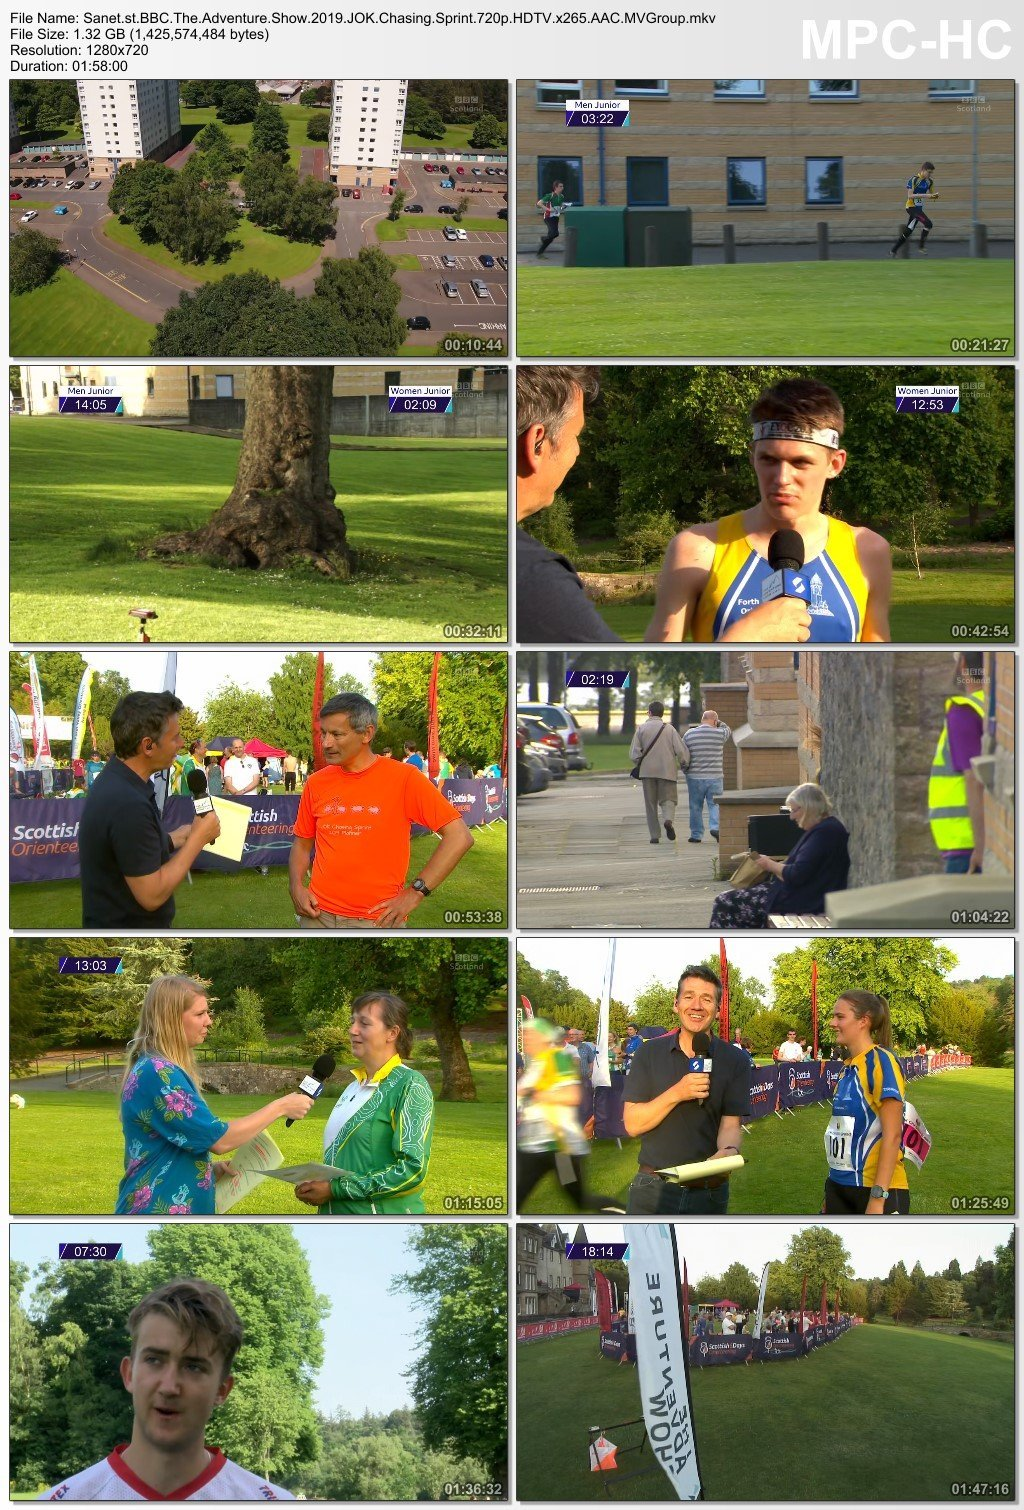 Download BBC The Adventure Show - JOK Chasing Sprint (2019